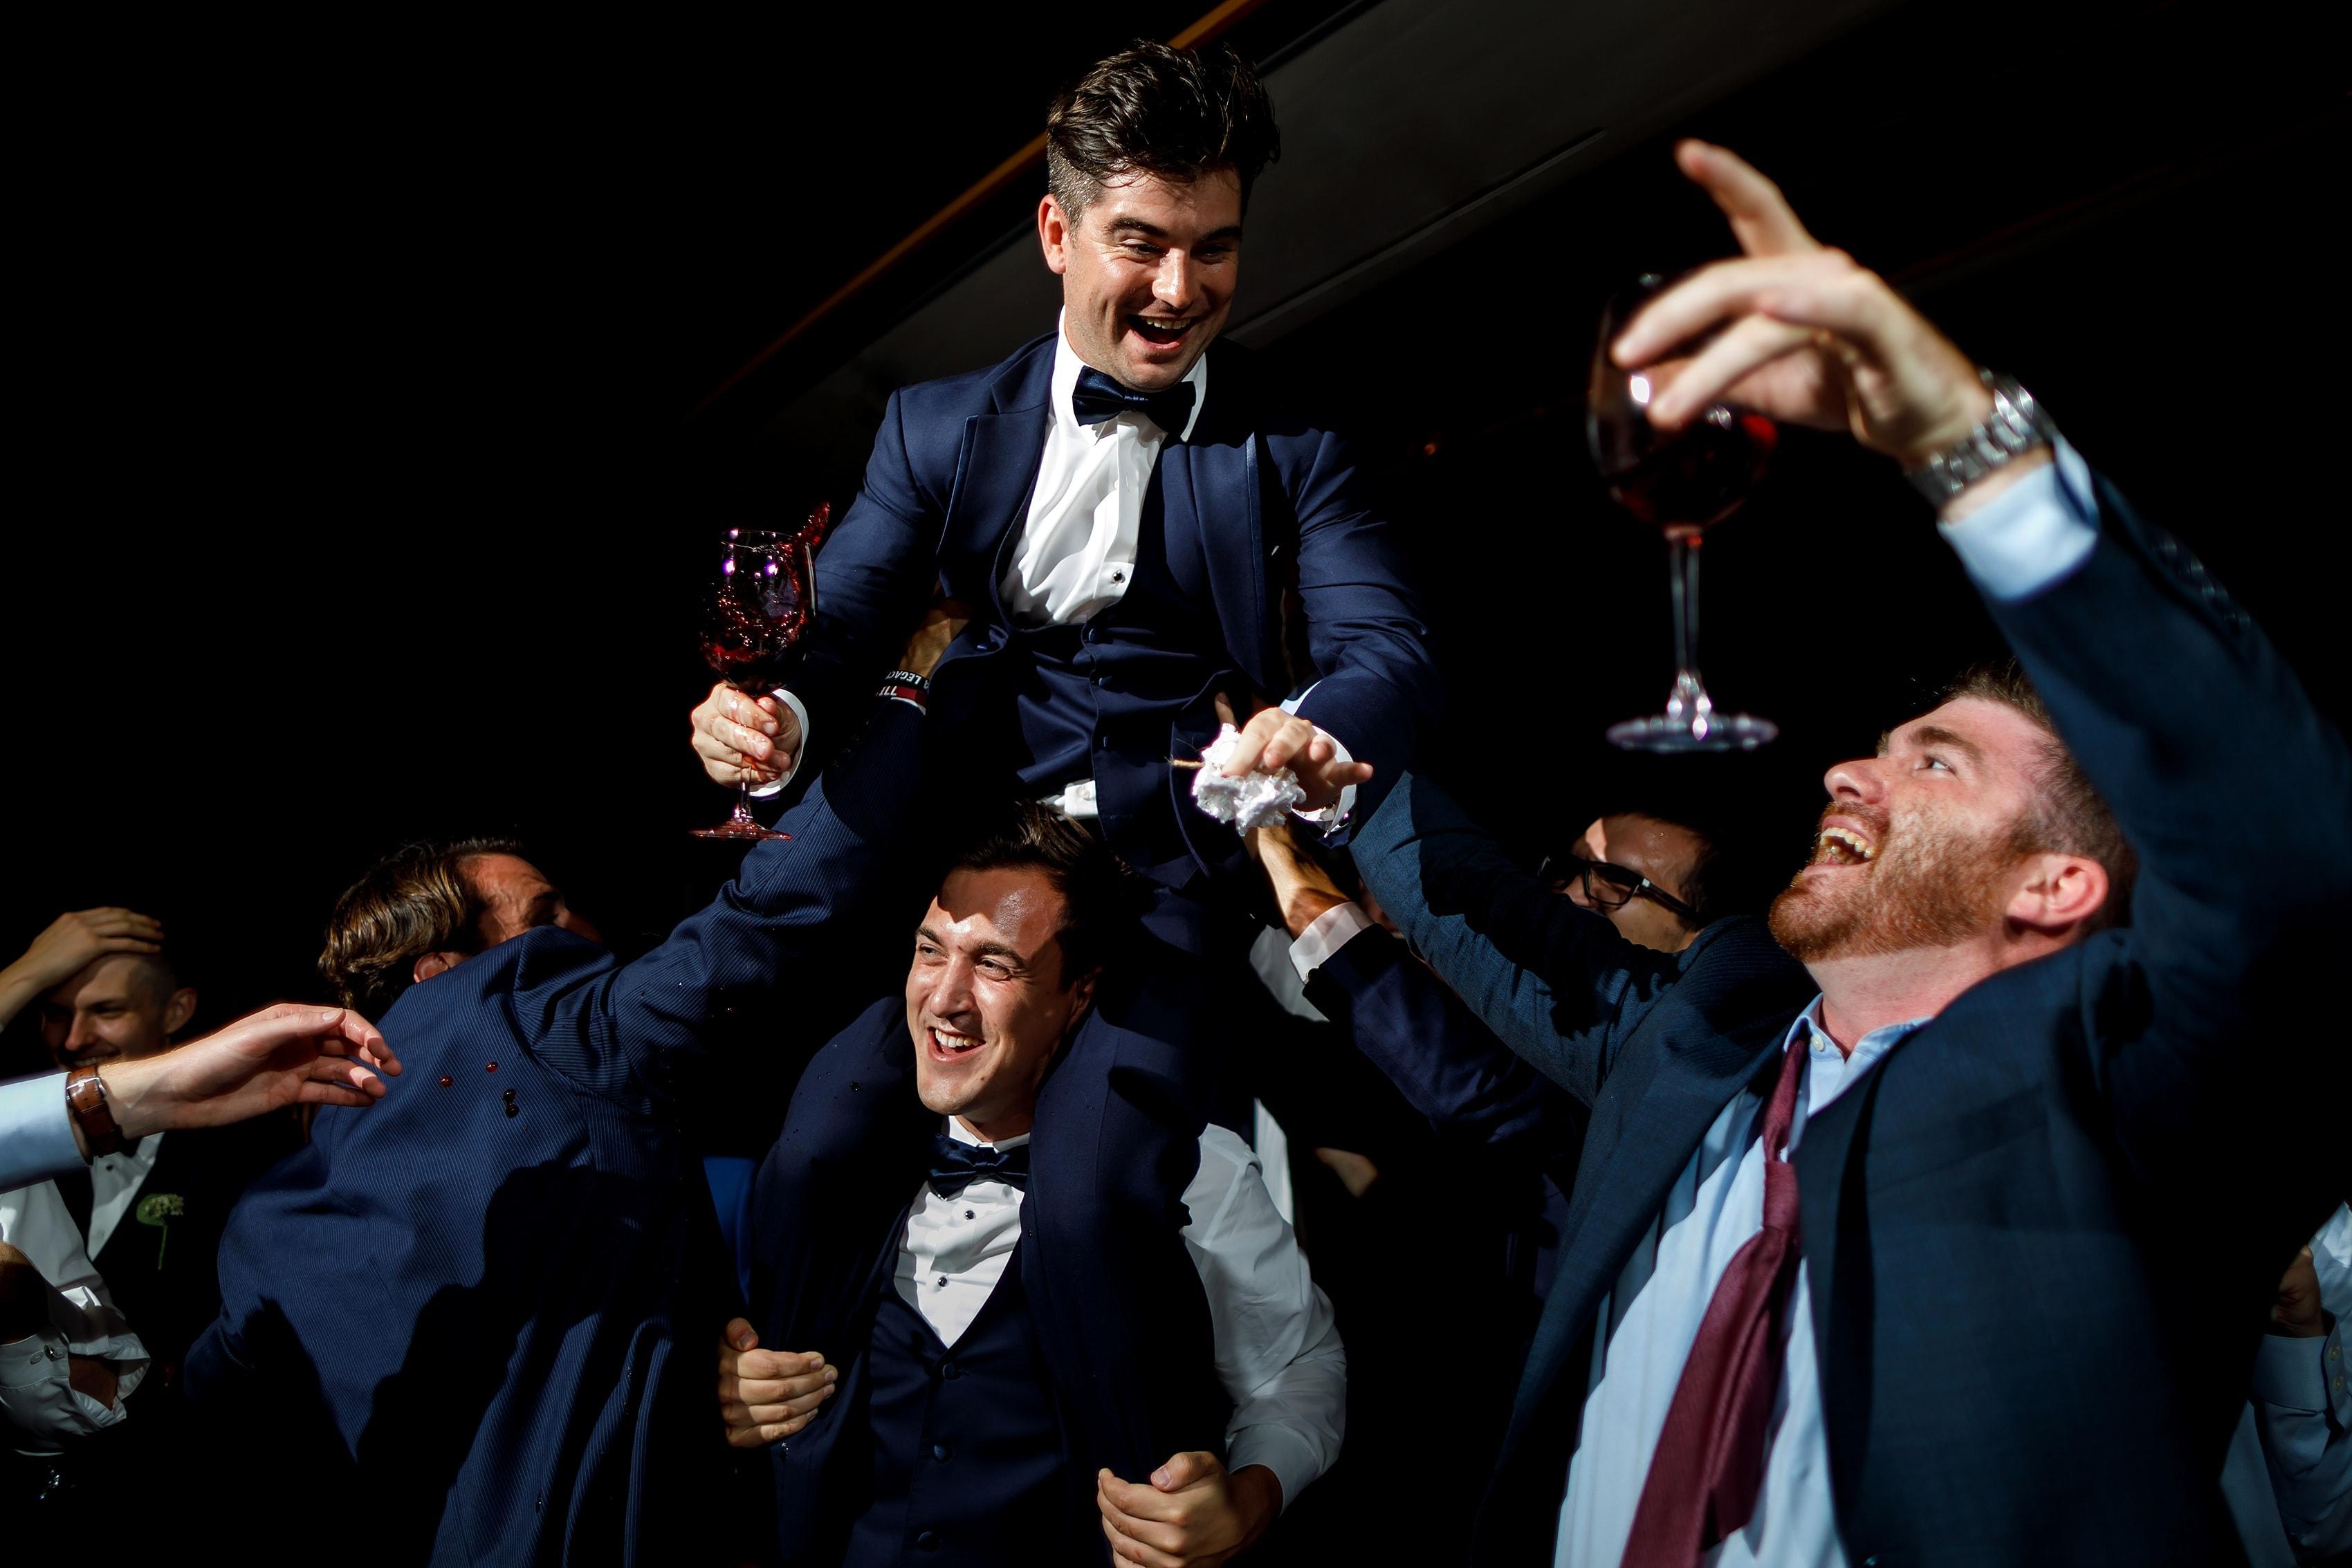 Groomsman on the shoulders of other groomsman during garter toss at wedding reception at Lake Geneva Yacht Club in Lake Geneva, Wisconsin